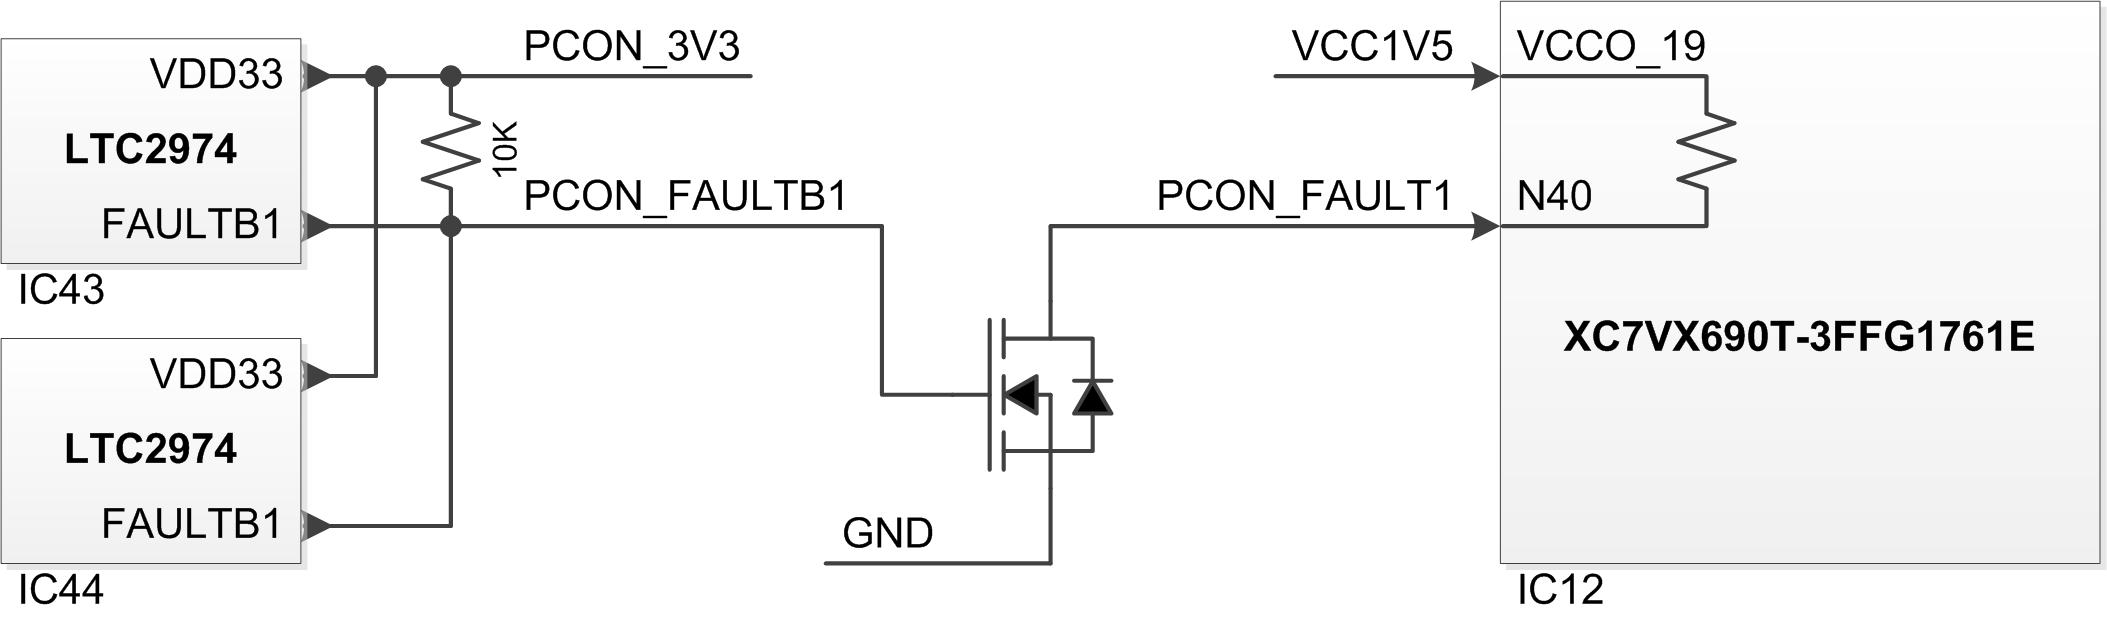 FAULTB1 Interrupt Source